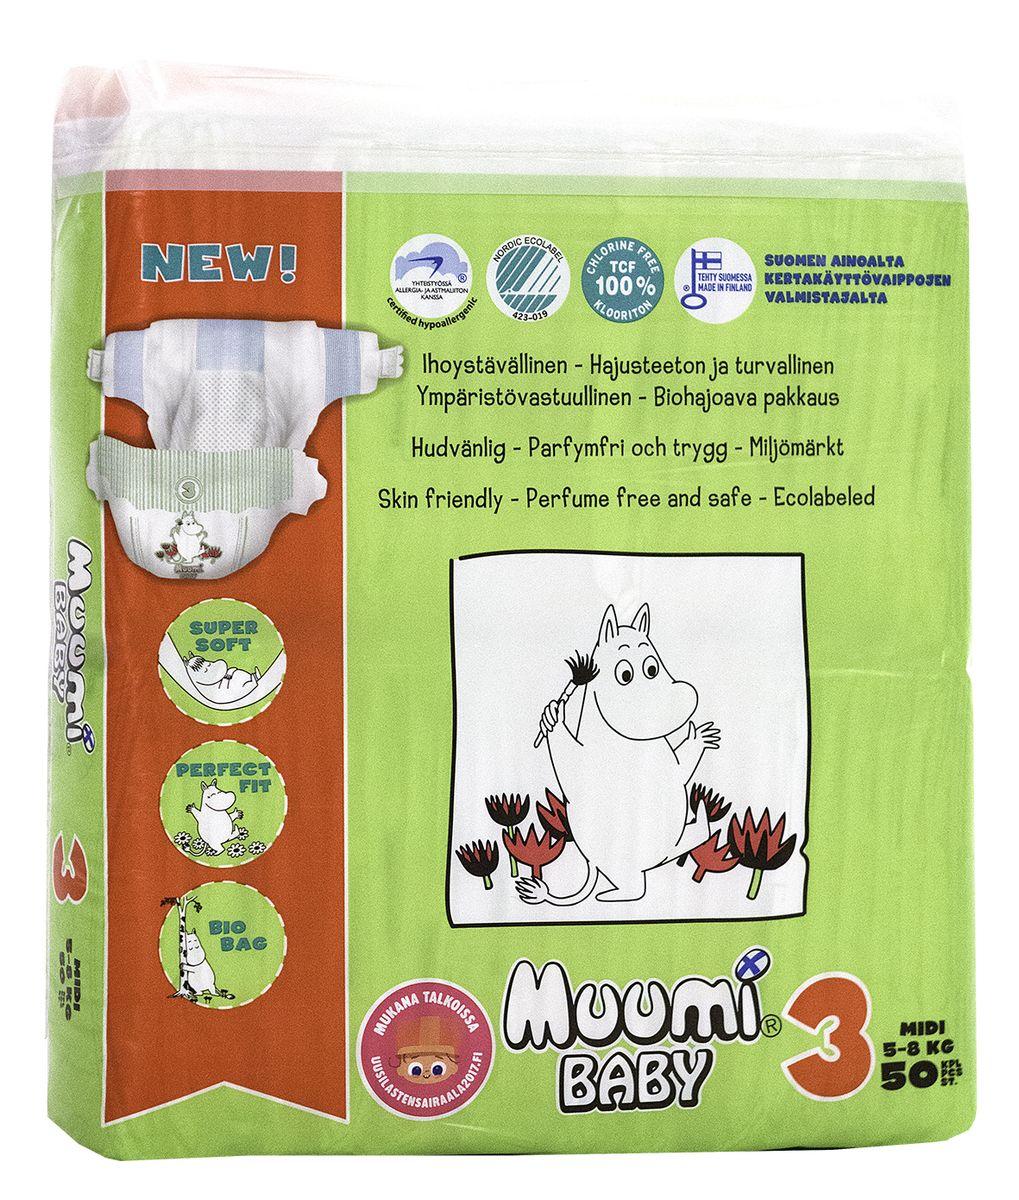 Muumi Подгузники Бейби Миди 3, 5-8 кг, 50 шт